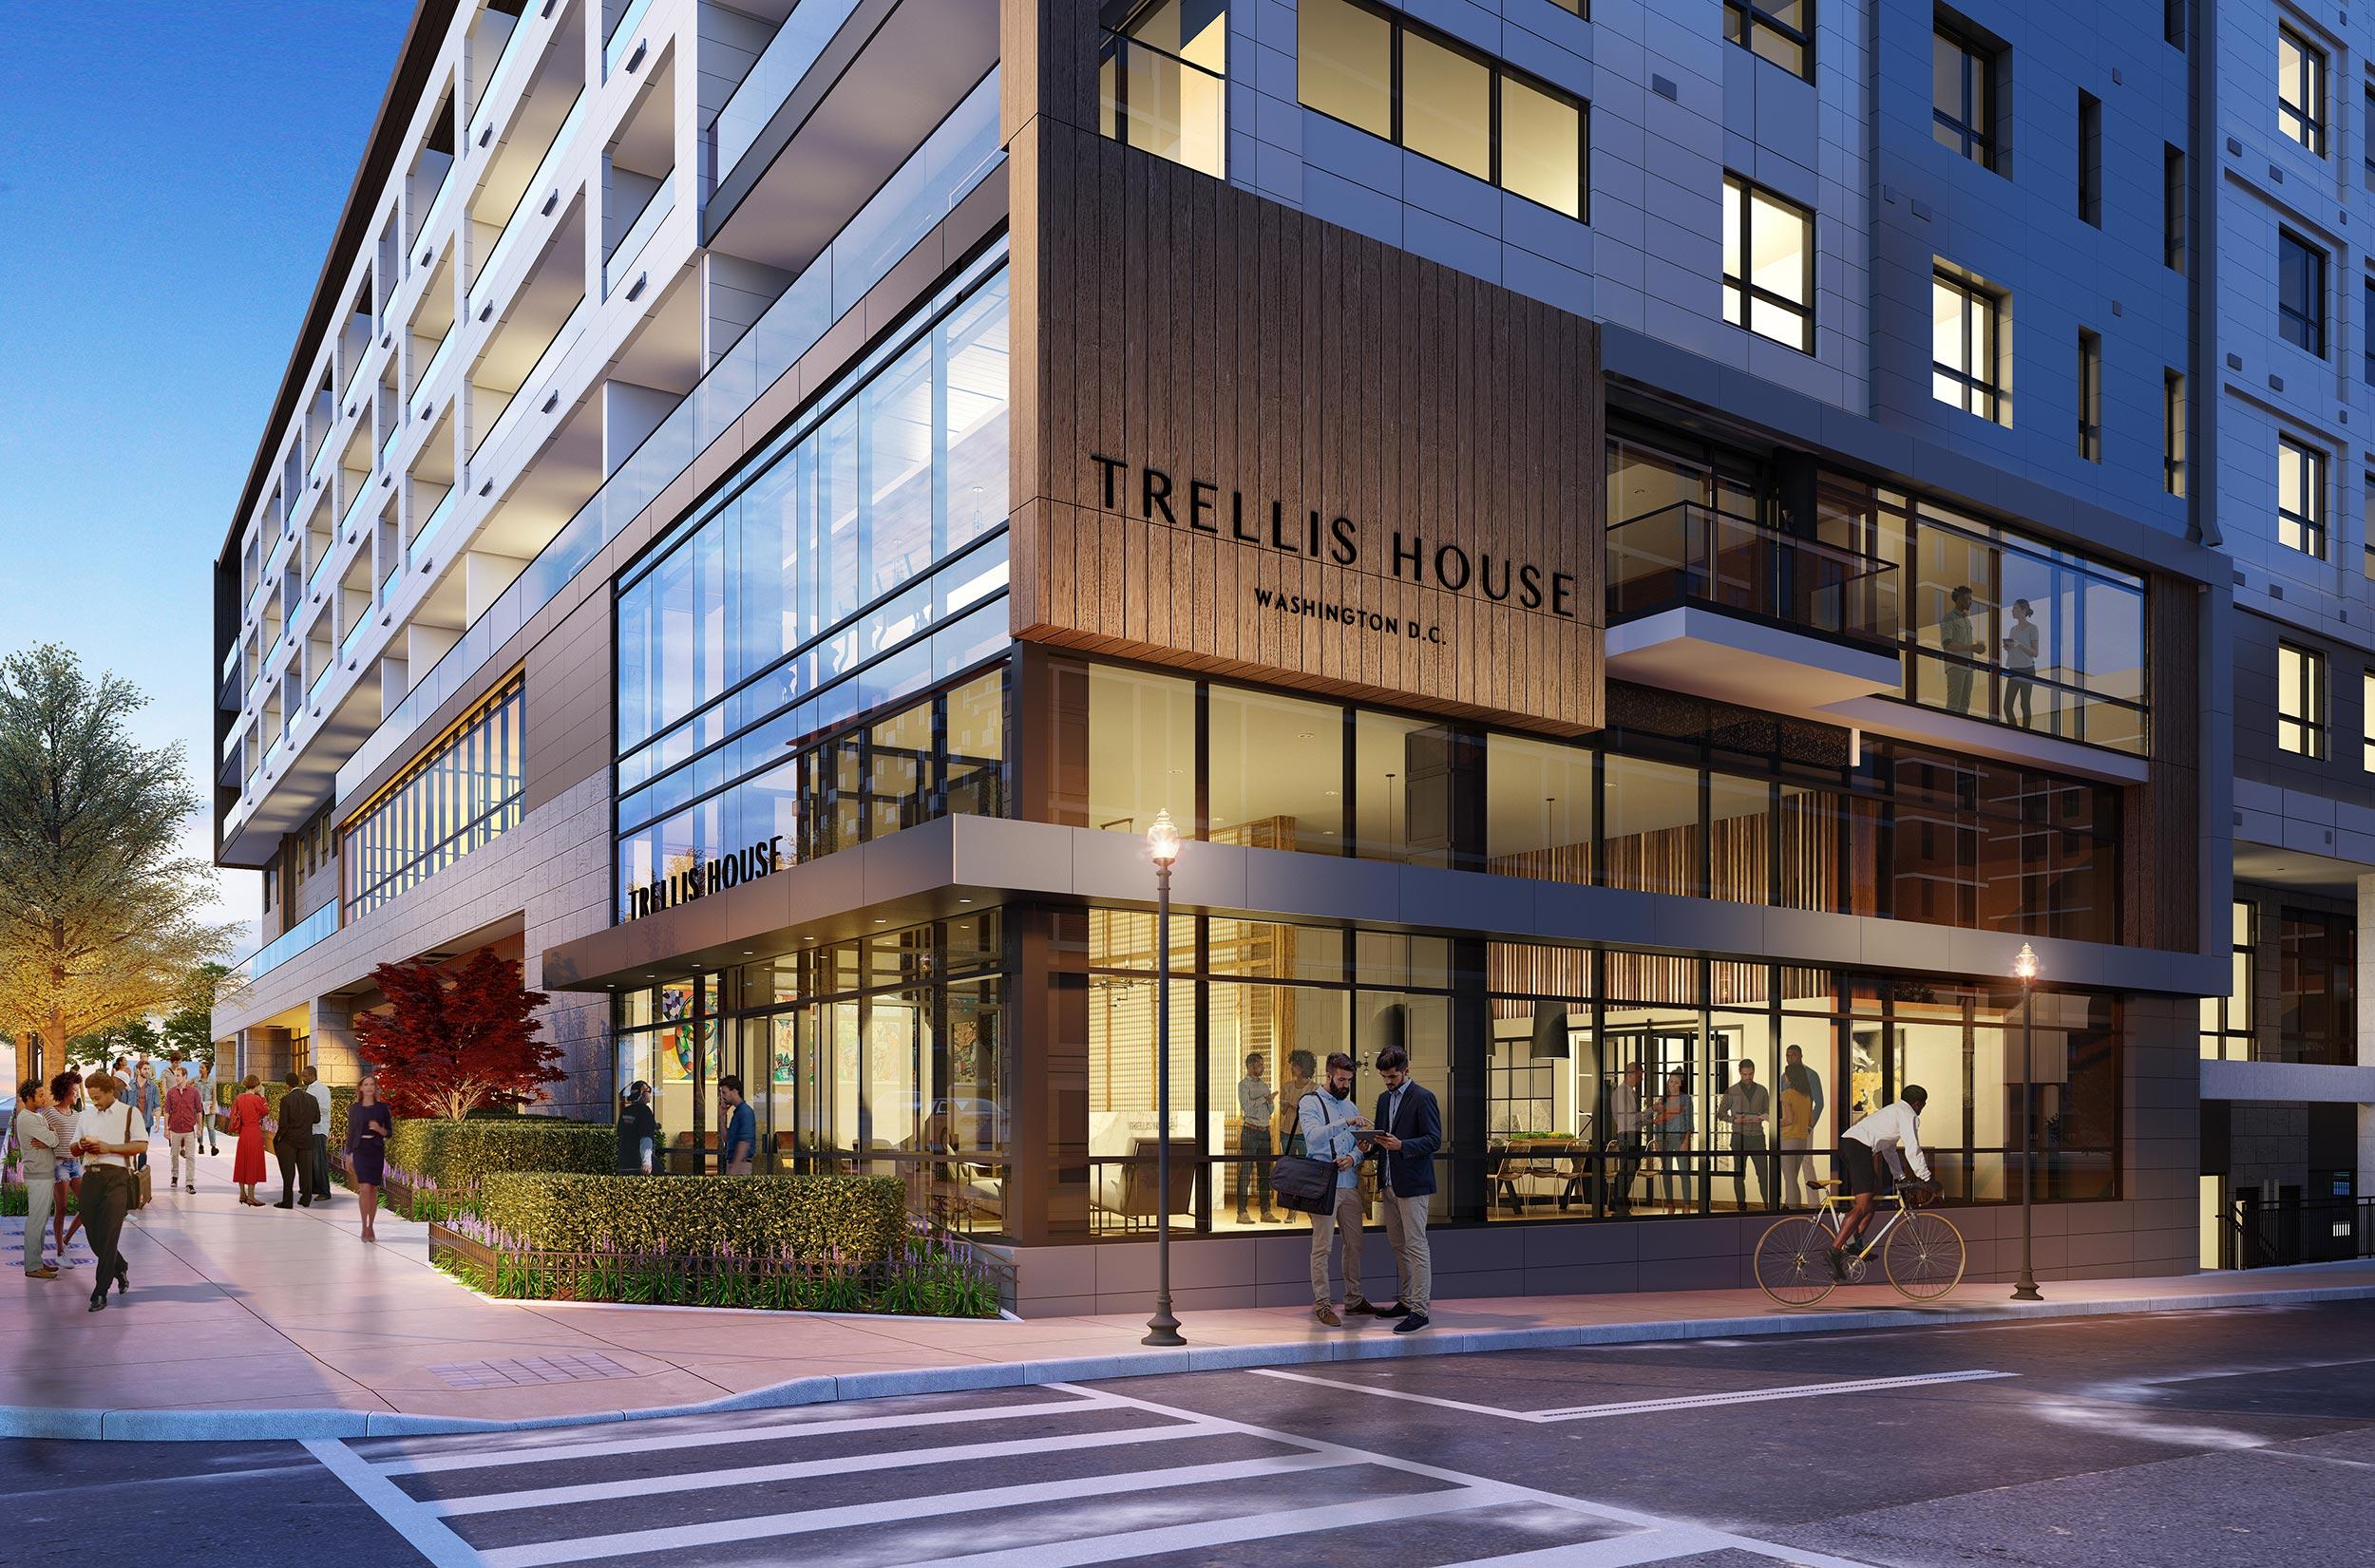 TrellisHouse_Entry.jpg